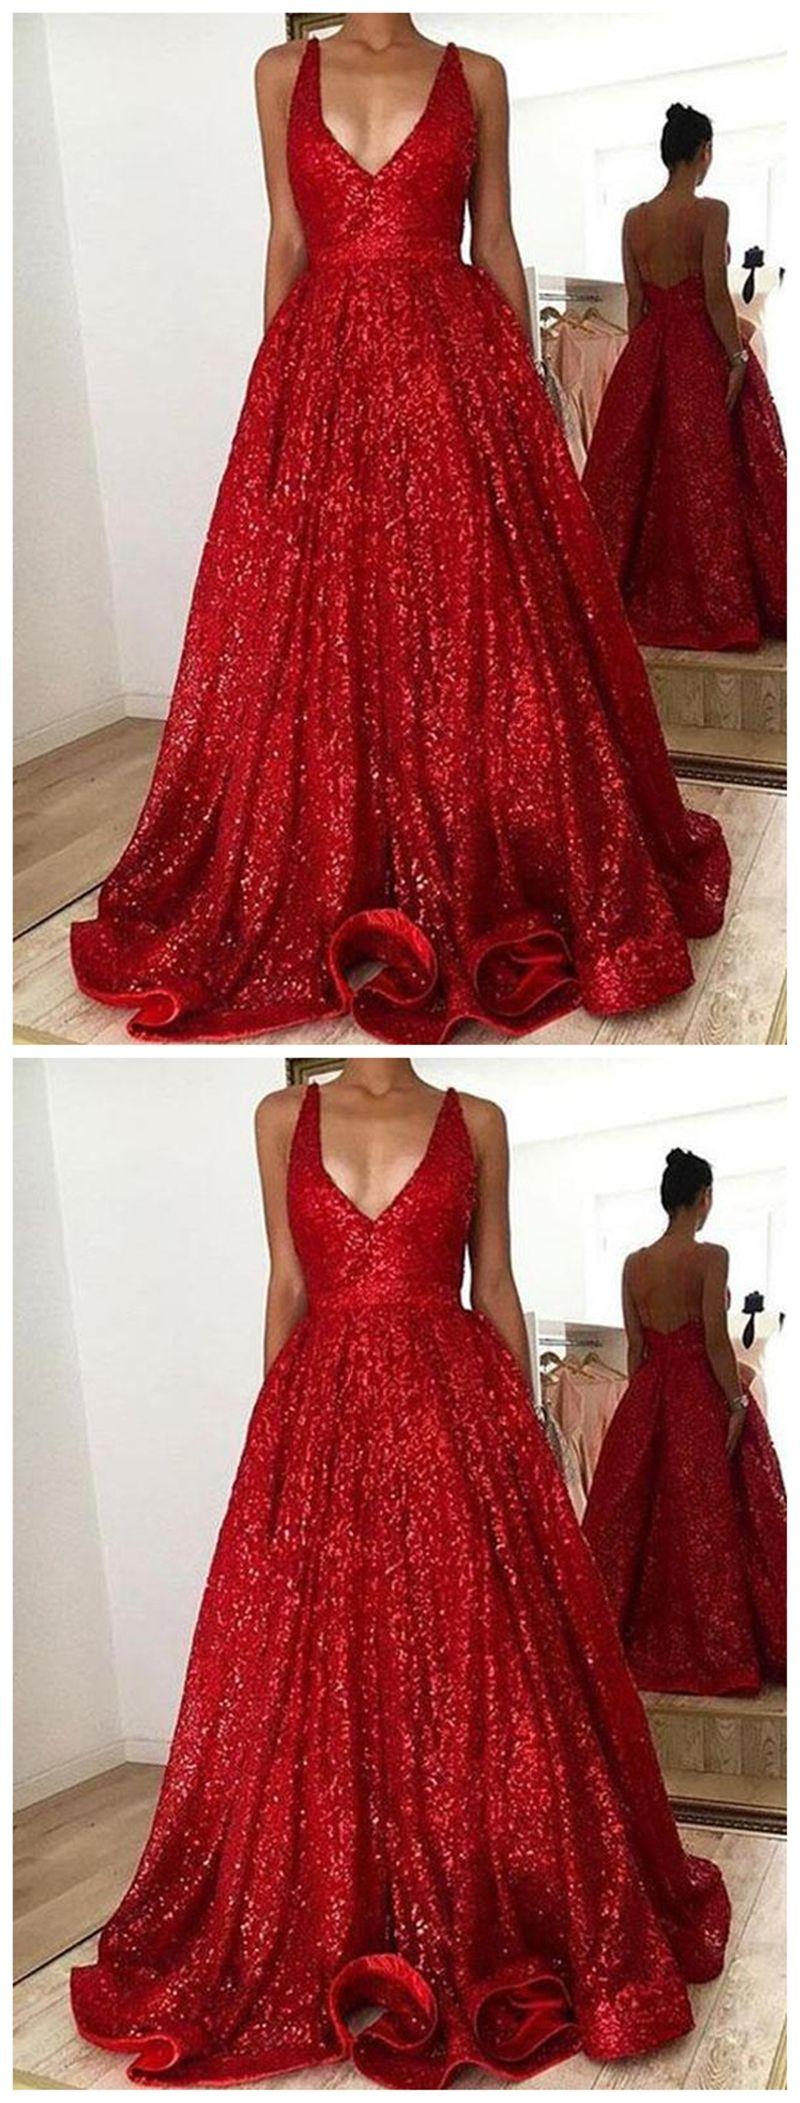 V neck backless sparkly red aline long evening prom dresses